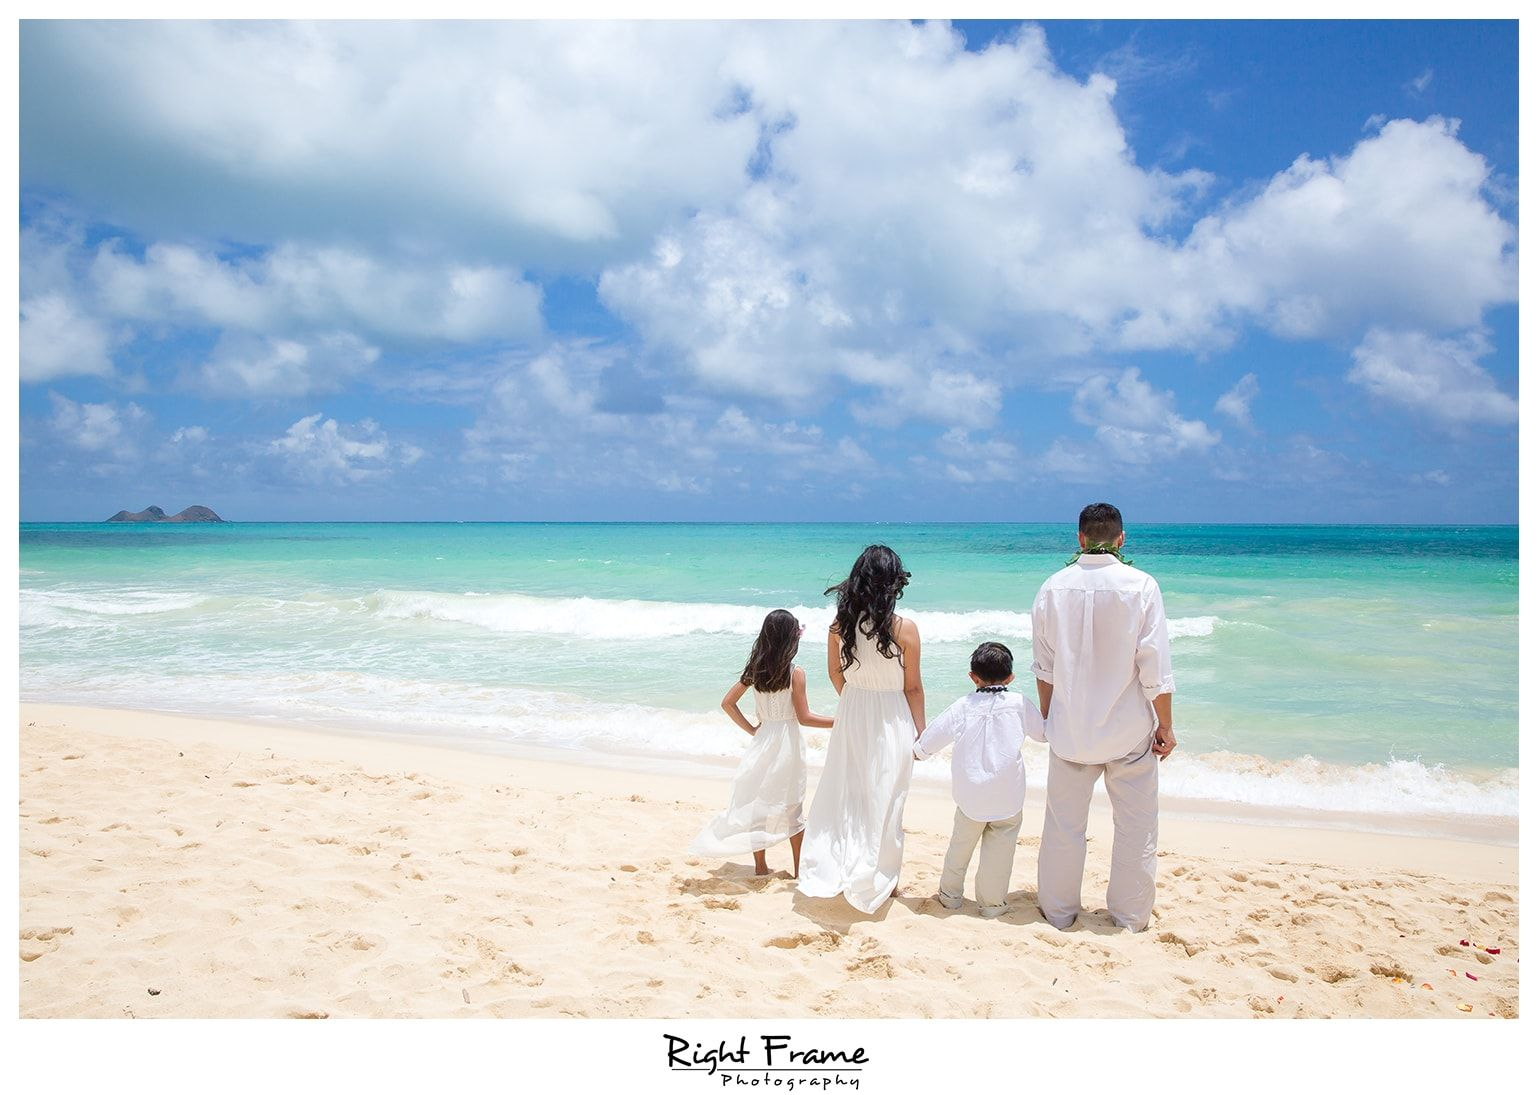 www.rightframe.net - Beautiful Destination Wedding Vow Renewal in ...